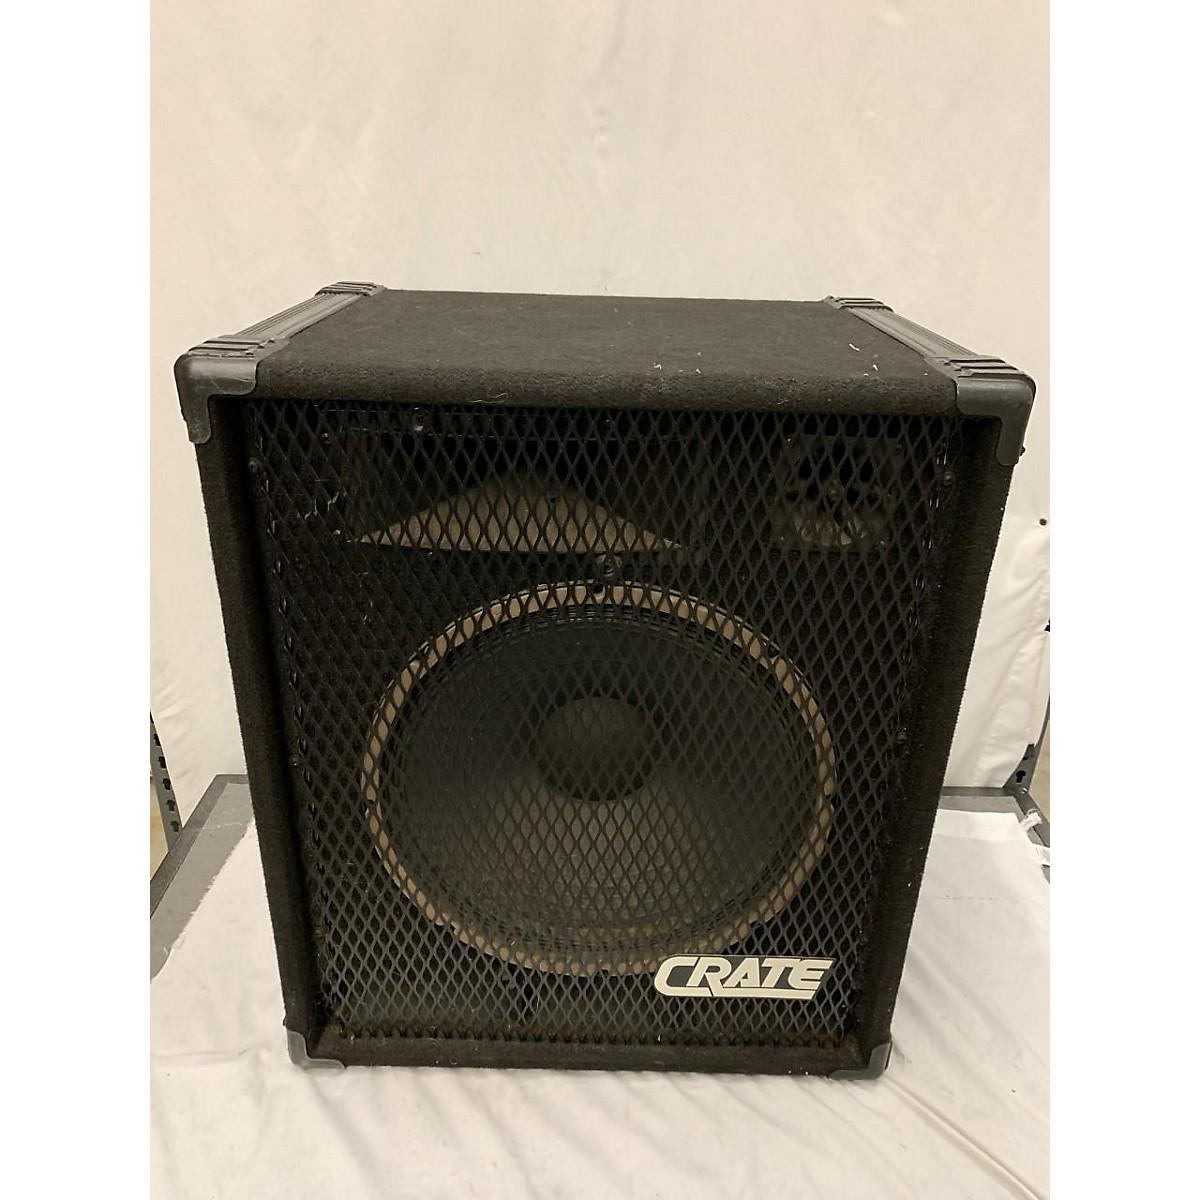 Crate PSM15P 15in 400W Powered Speaker